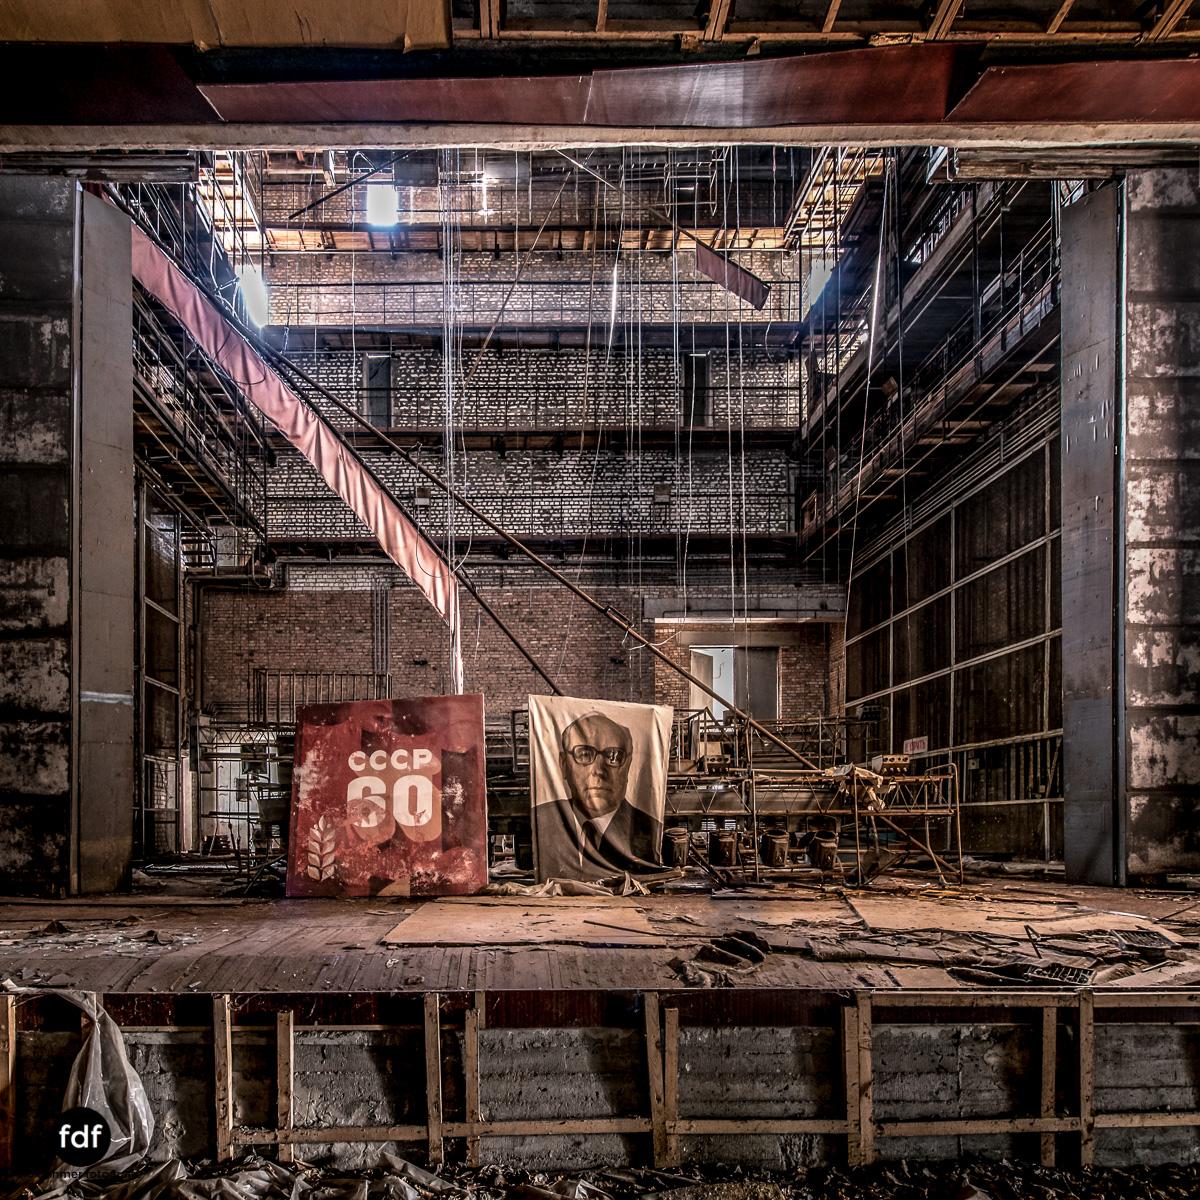 Tschernobyl-Chernobyl-Prypjat-Urbex-Lost-Place-Kulturpalast-Energetik-9.jpg